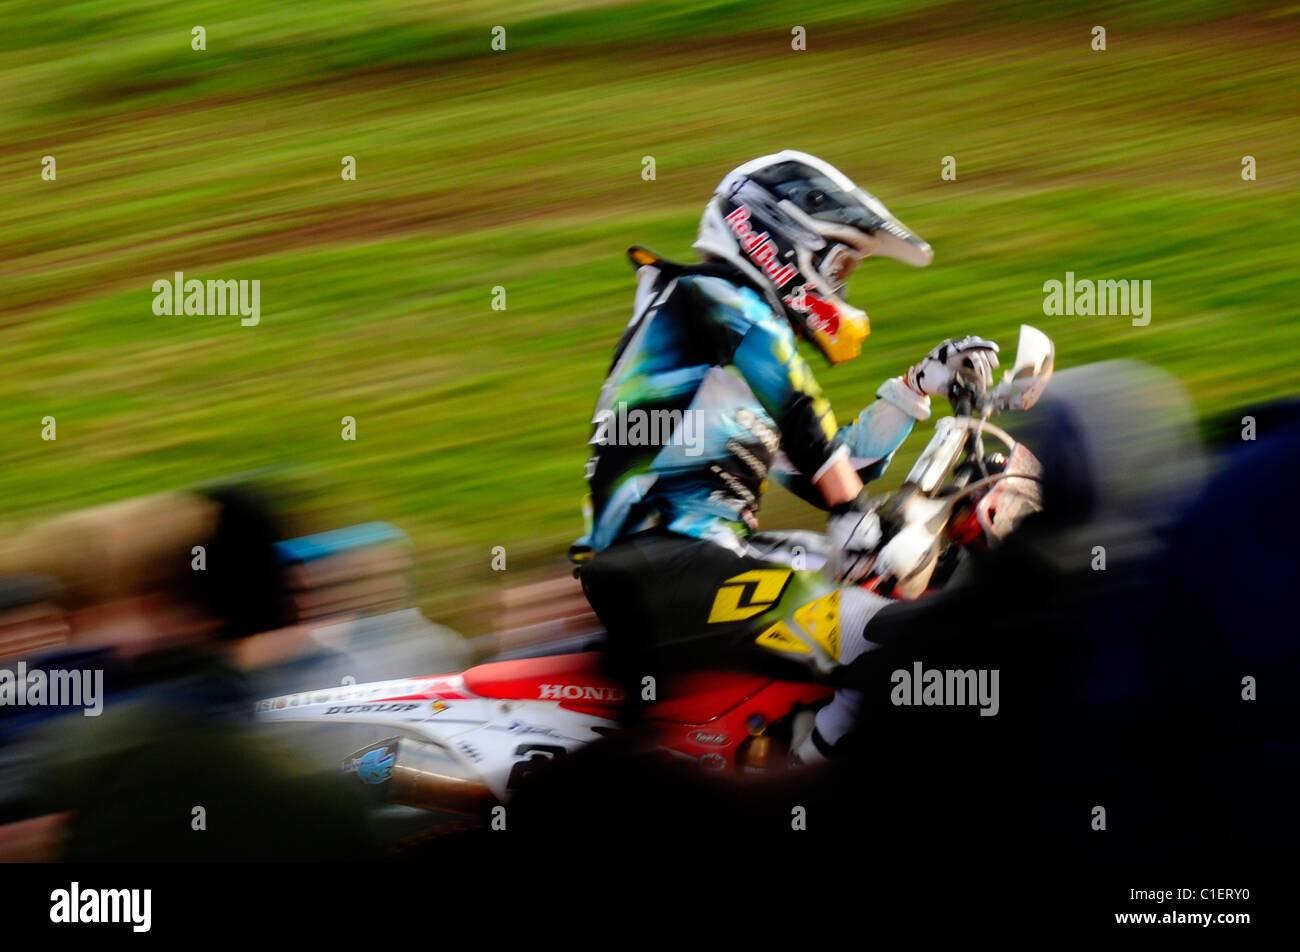 Shaun Simpson - Maxxis British Motocross 2011 - Stock Image